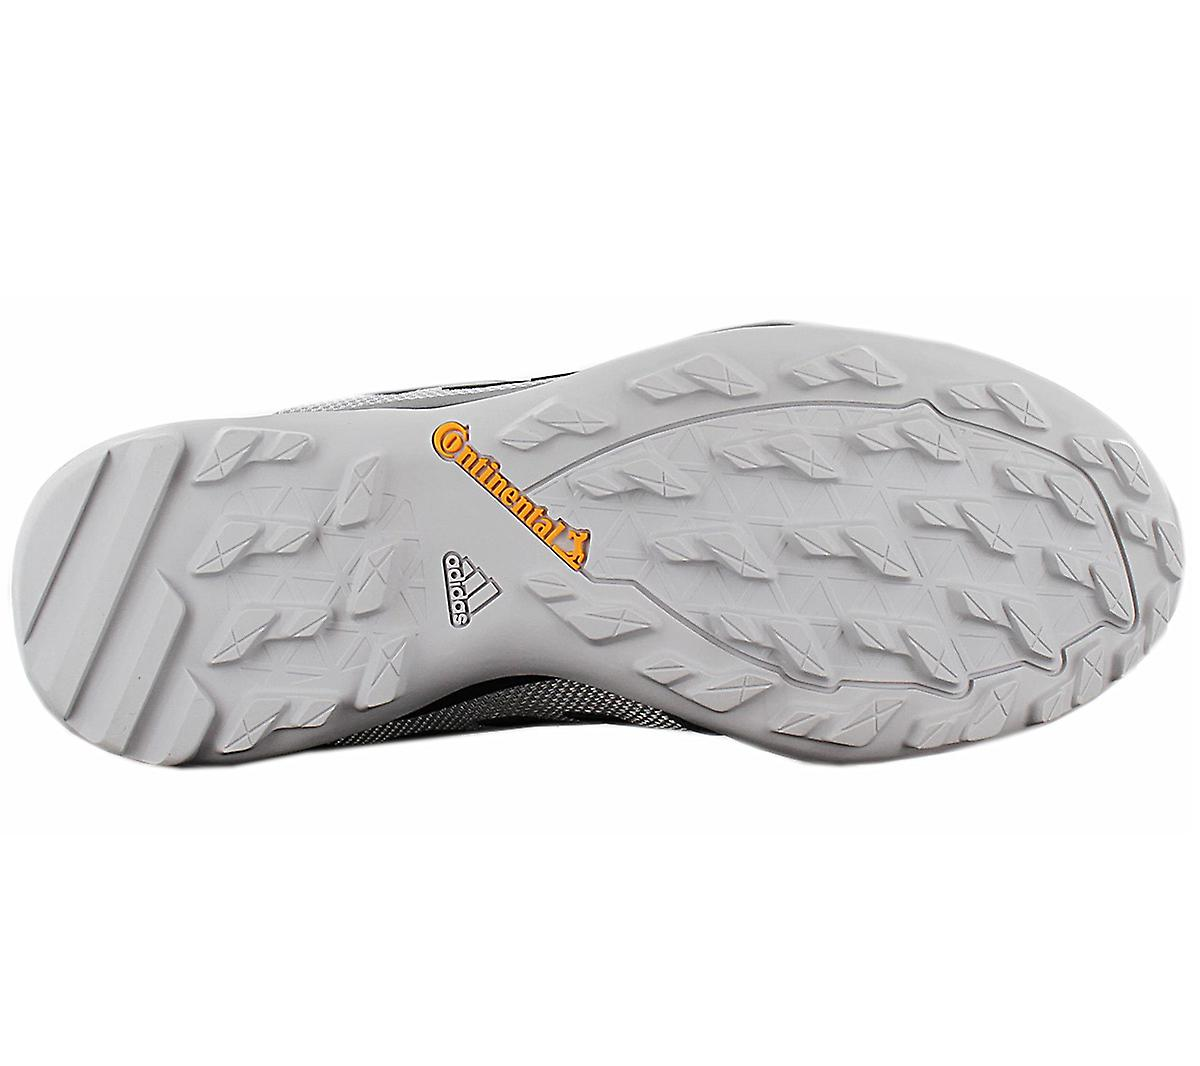 adidas TERREX AX3 - Herren Wanderschuhe Grau EF0533 Sneakers Sportschuhe